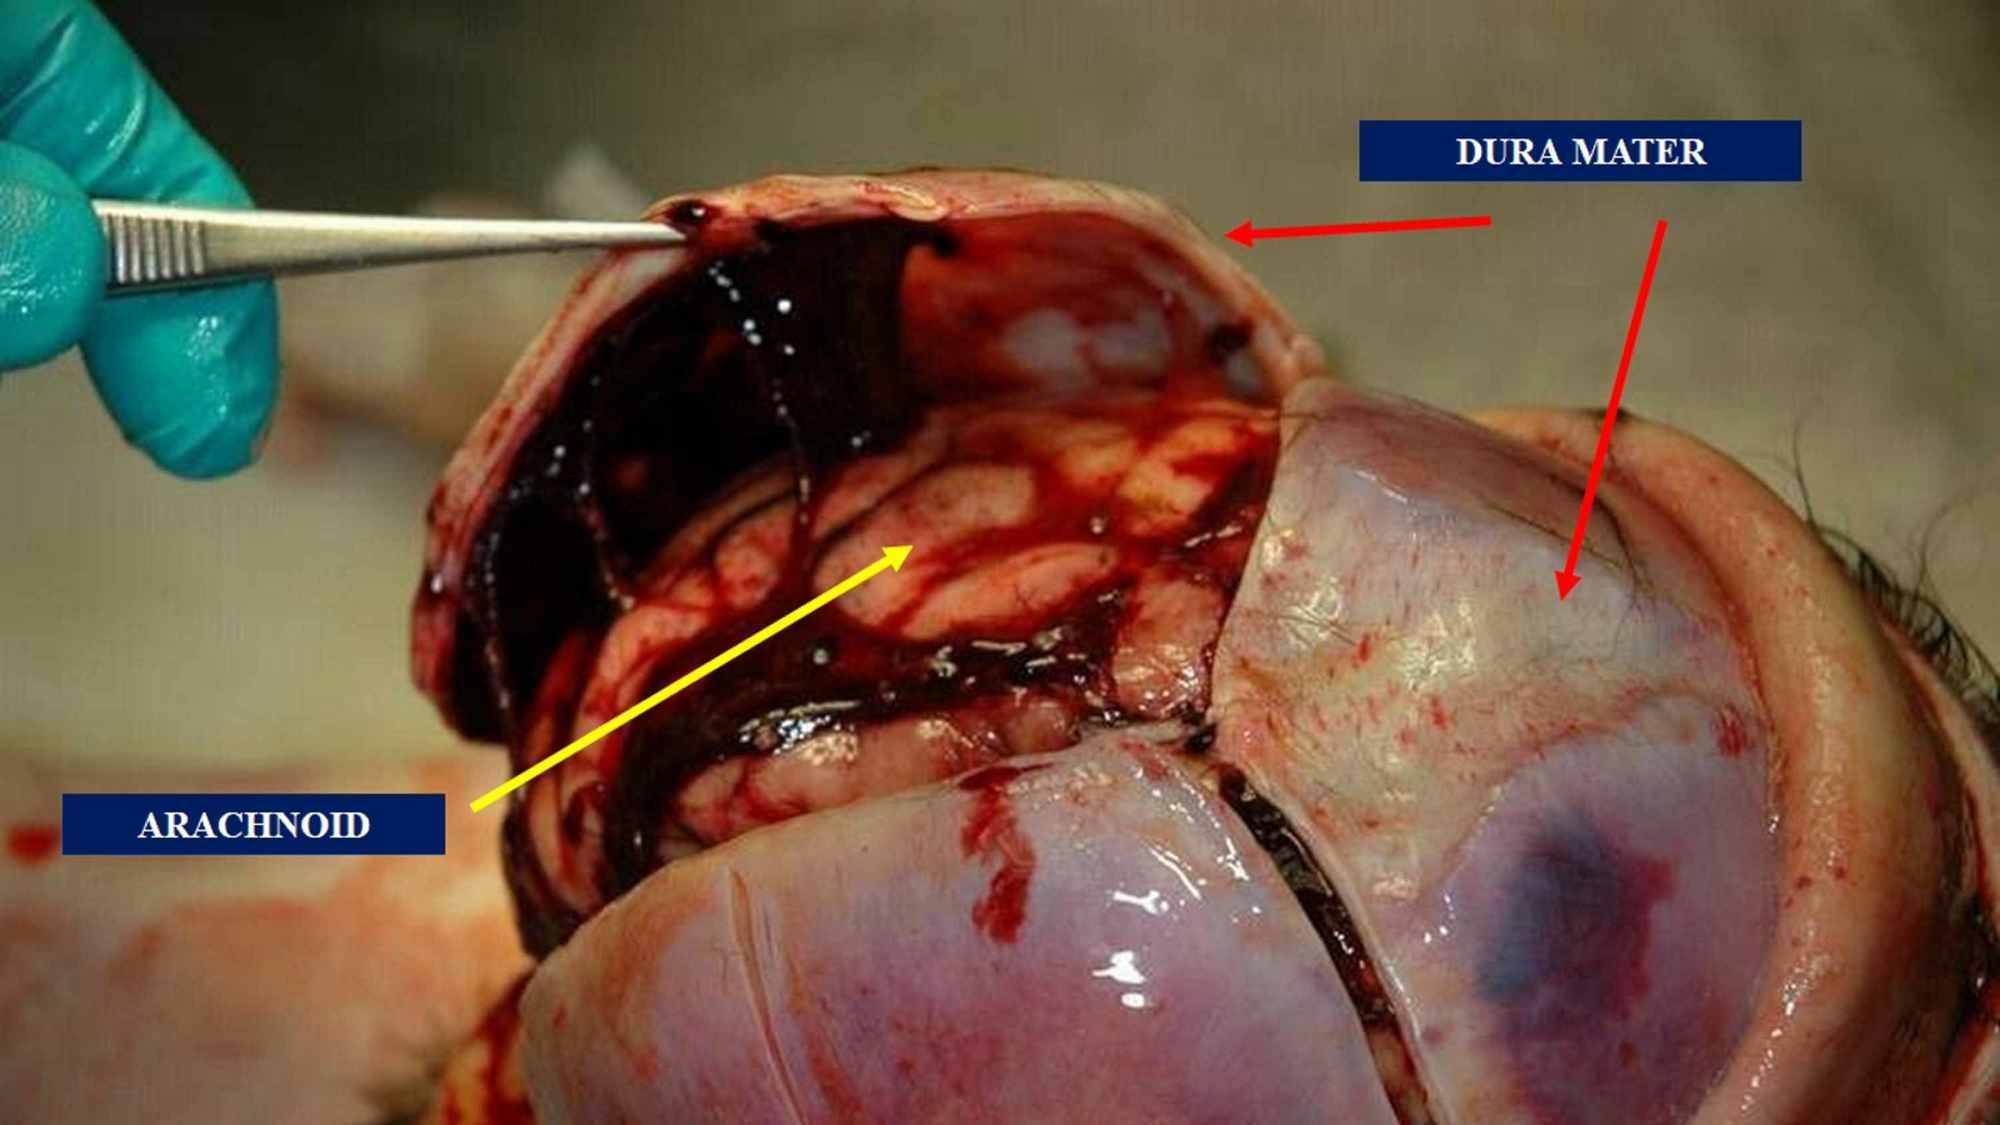 Cureus   Tentorium Cerebelli: Muscles, Ligaments, and Dura ...